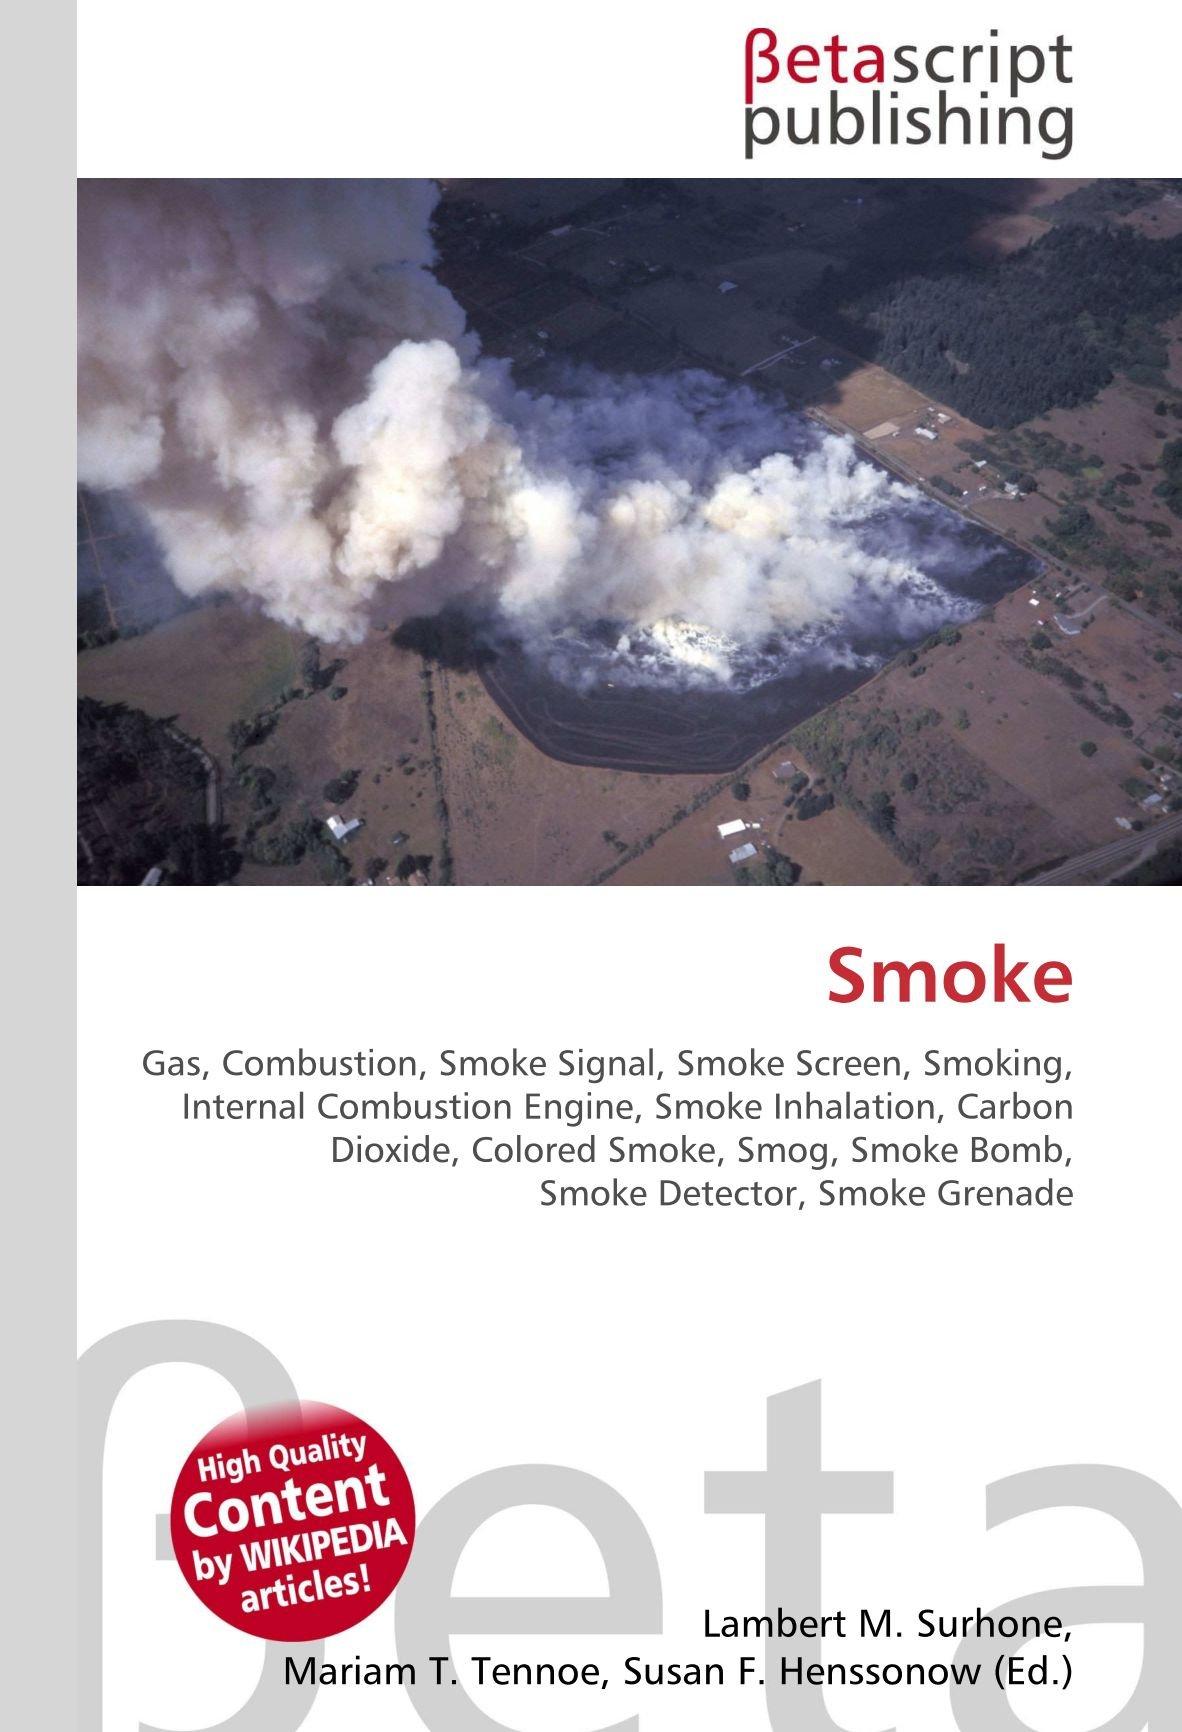 ... Smoke Inhalation, Carbon Dioxide, Colored Smoke, Smog, Smoke Bomb, Smoke Detector, Smoke Grenade: Amazon.es: Lambert M. Surhone, Miriam T. Timpledon, ...